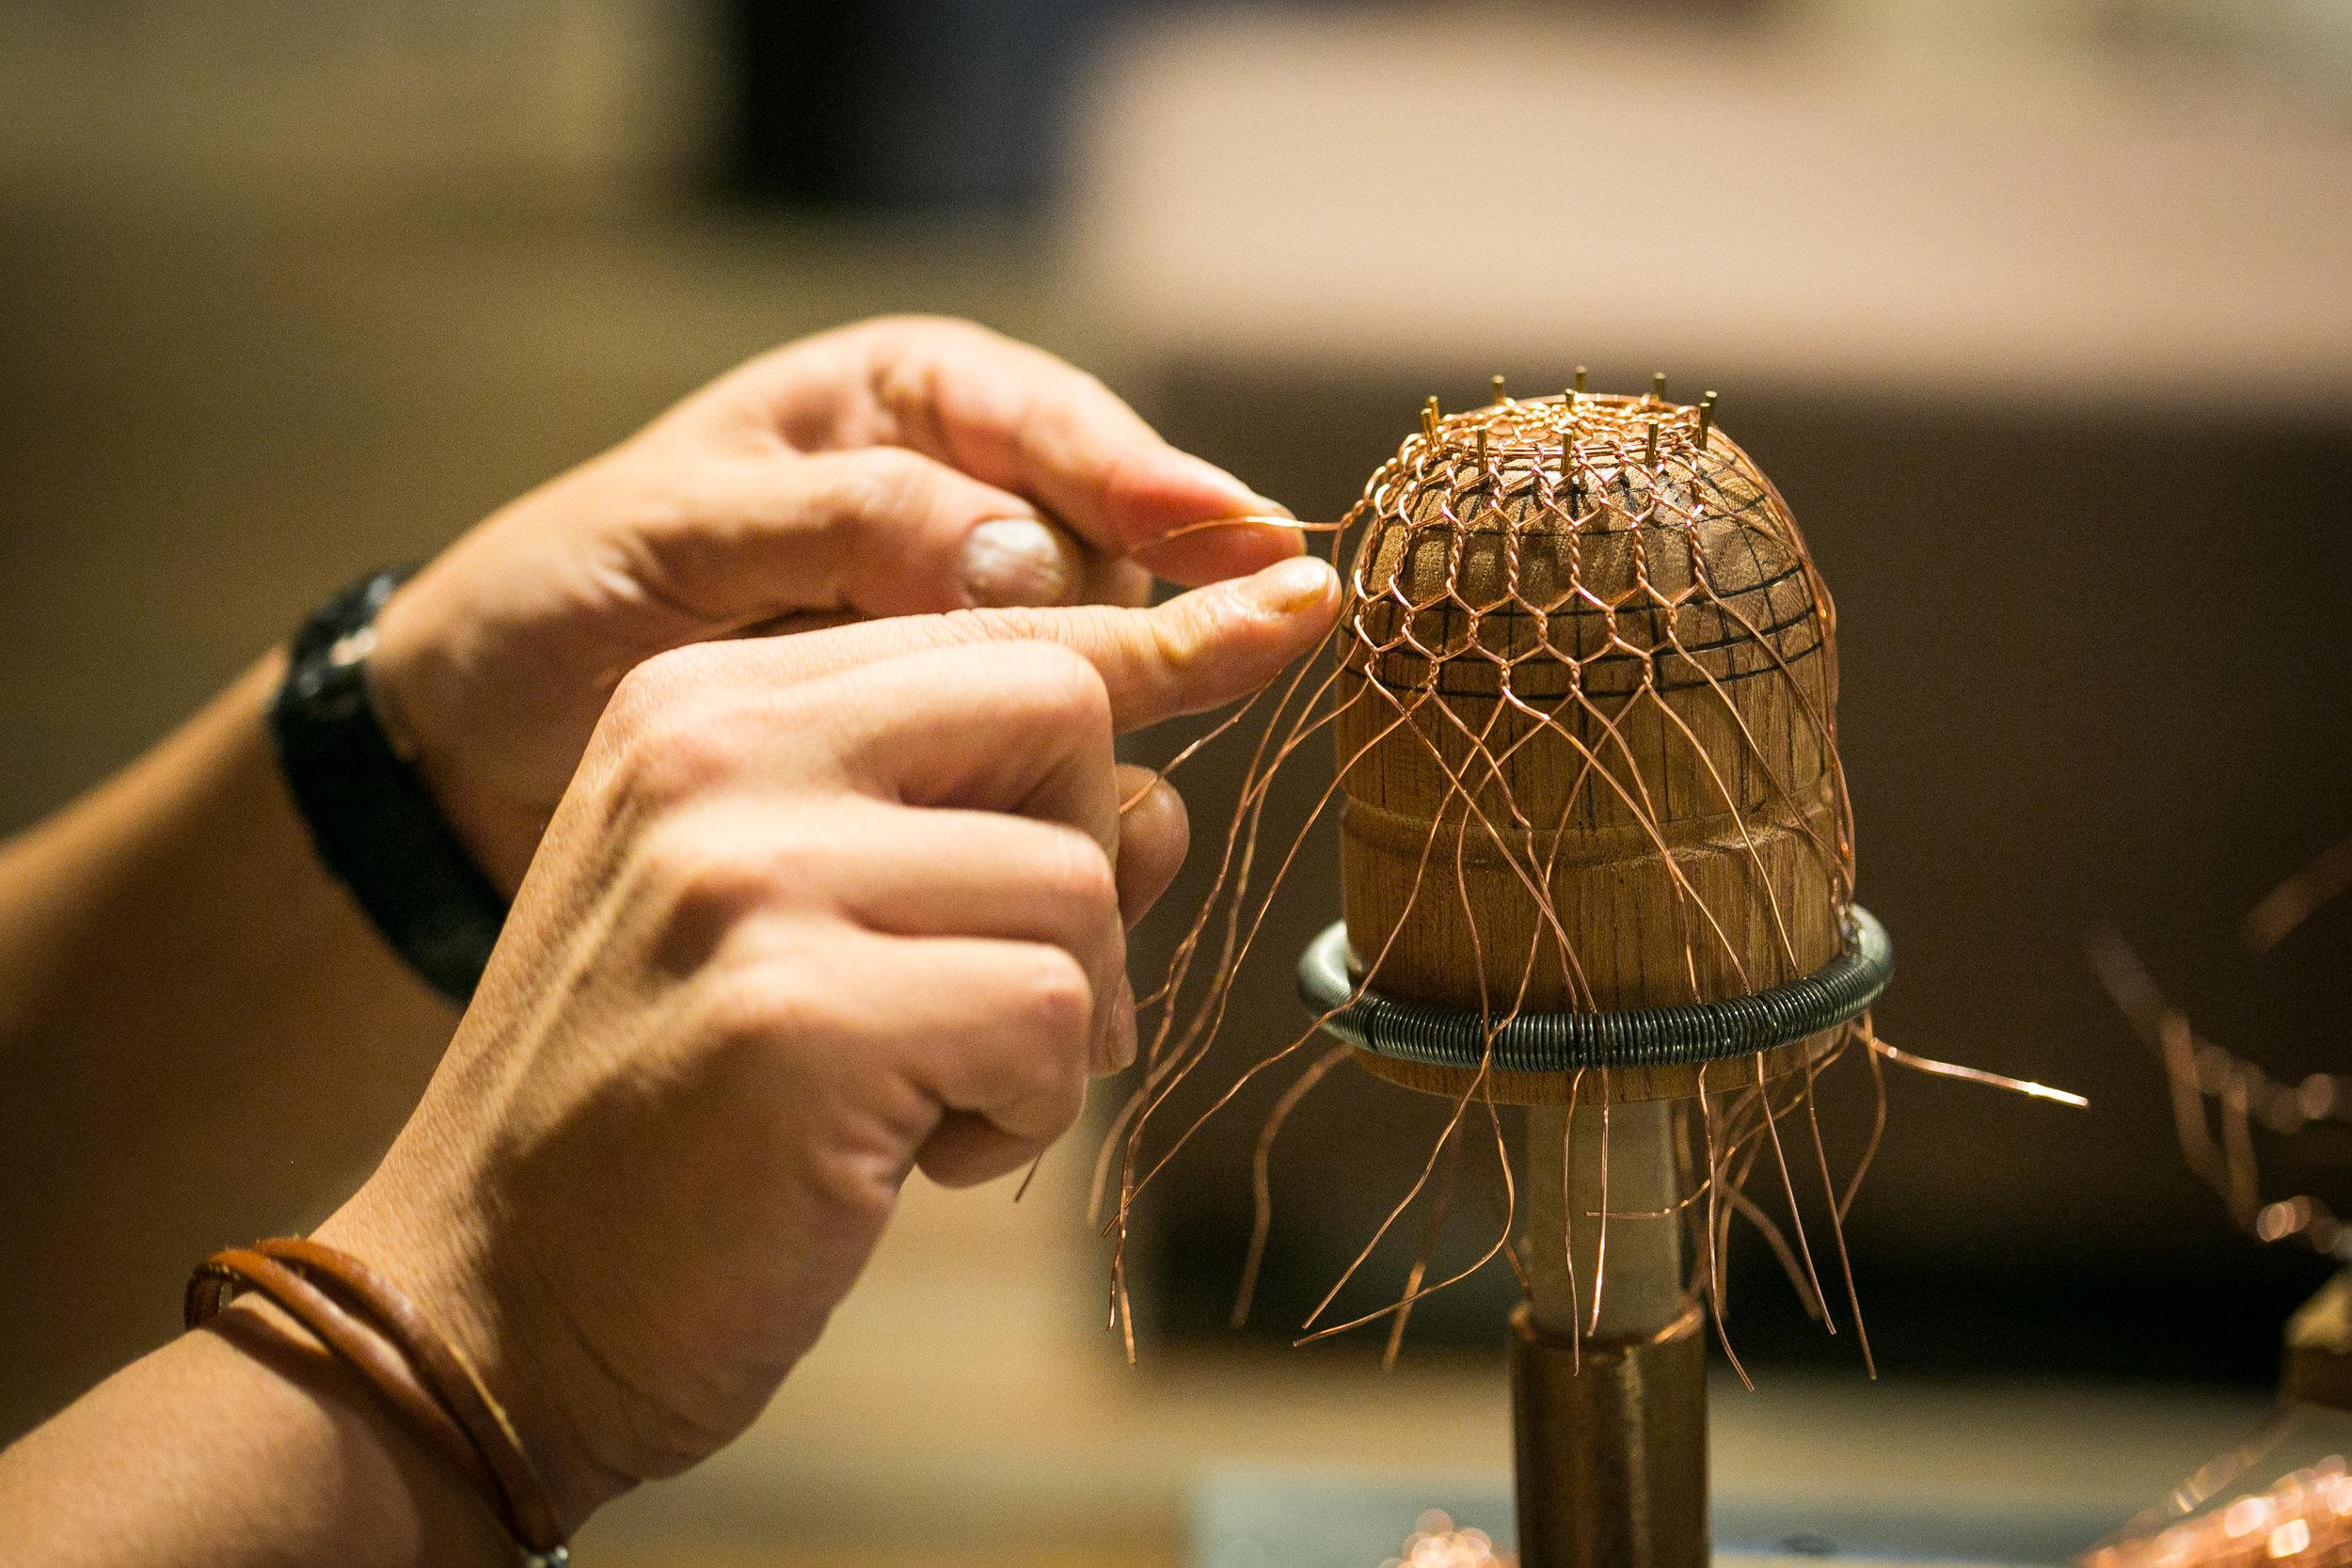 Kanaami-Tsuji Les Ateliers Courbet Kyoto Master-Craftsmen Japan Handmade